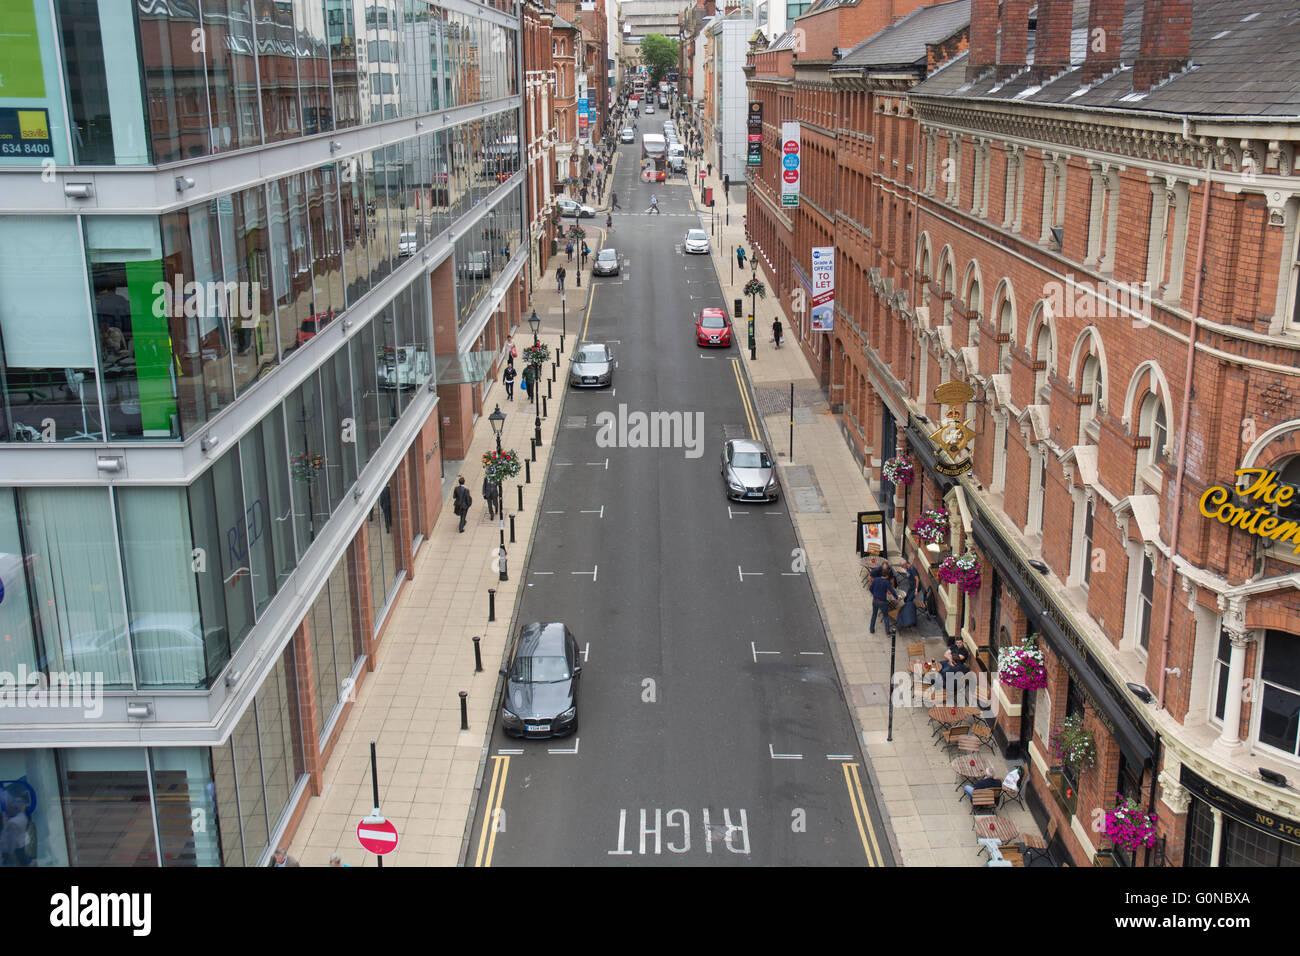 view down Edmund Street in Birmingham city centre, UK - Stock Image